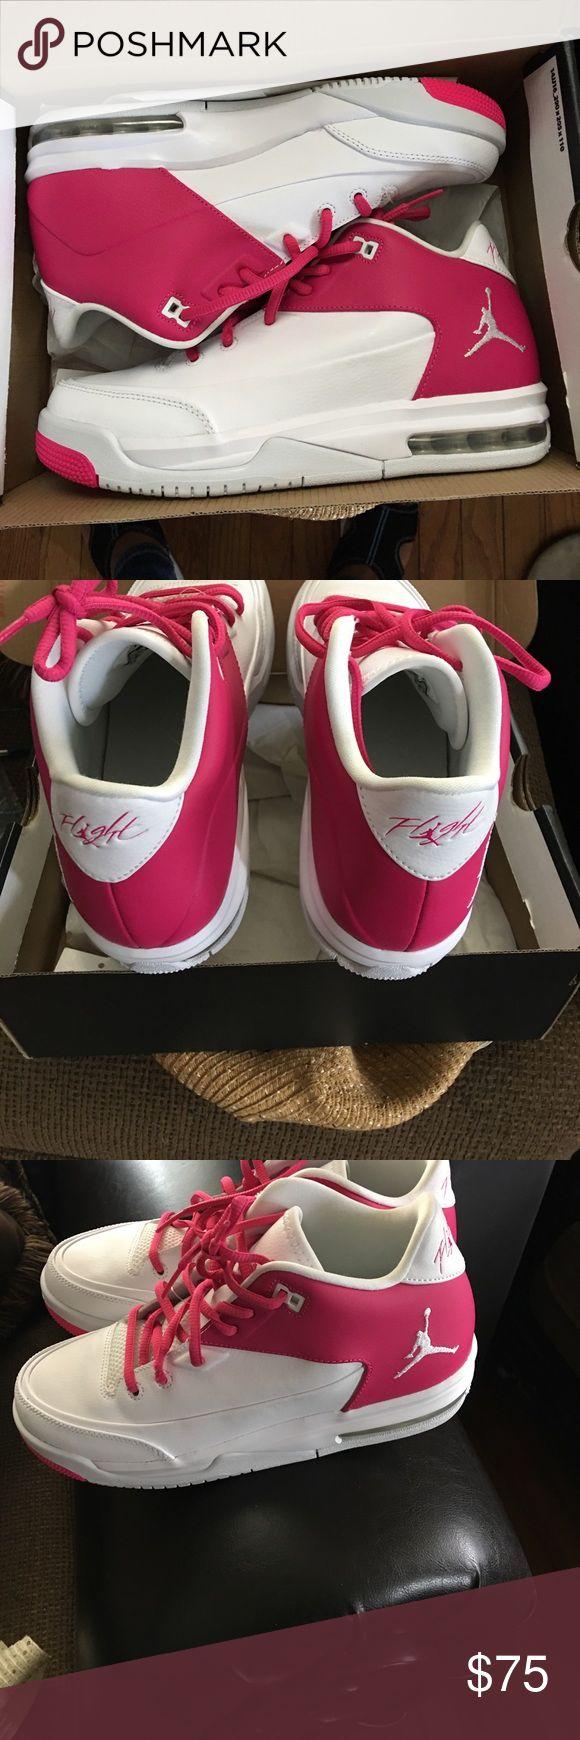 Pink white Jordan Pink and white 6 1/2 Jordan flights Jordan Shoes Sneakers